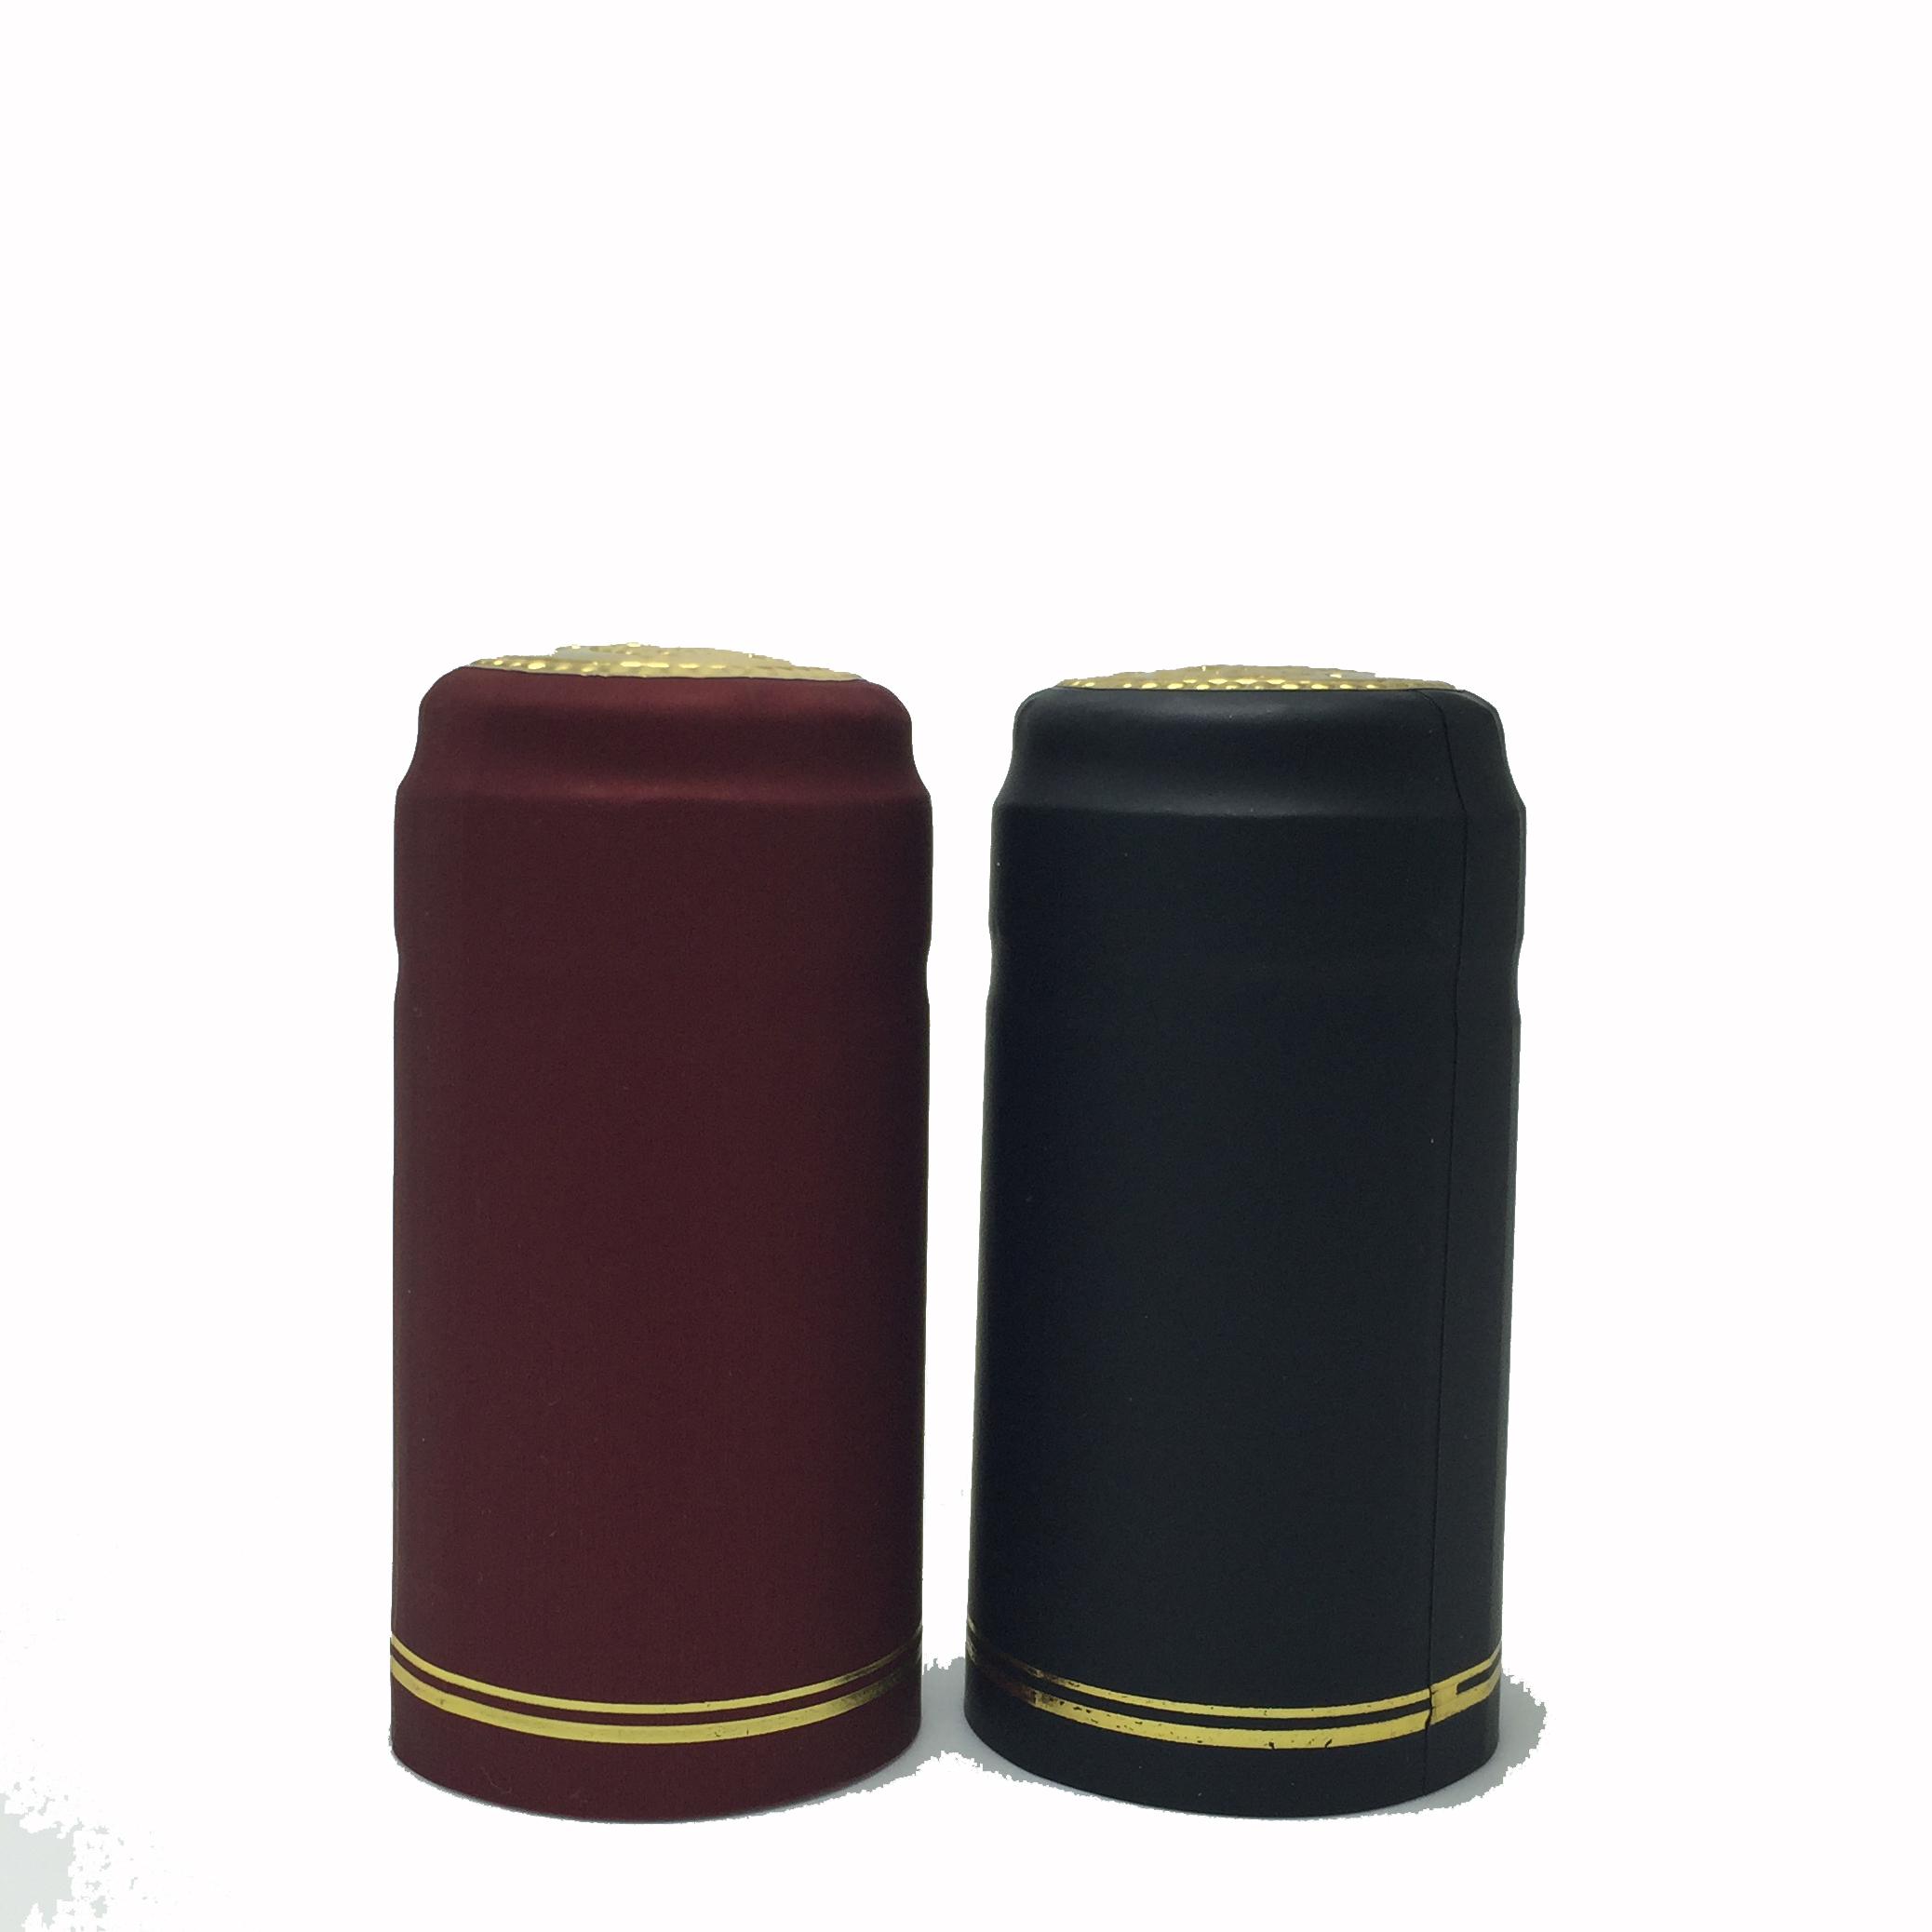 Черная пластиковая крышка капсулы из ПВХ, термоусадочная крышка для бутылок, термоусадочная крышка бордового цвета